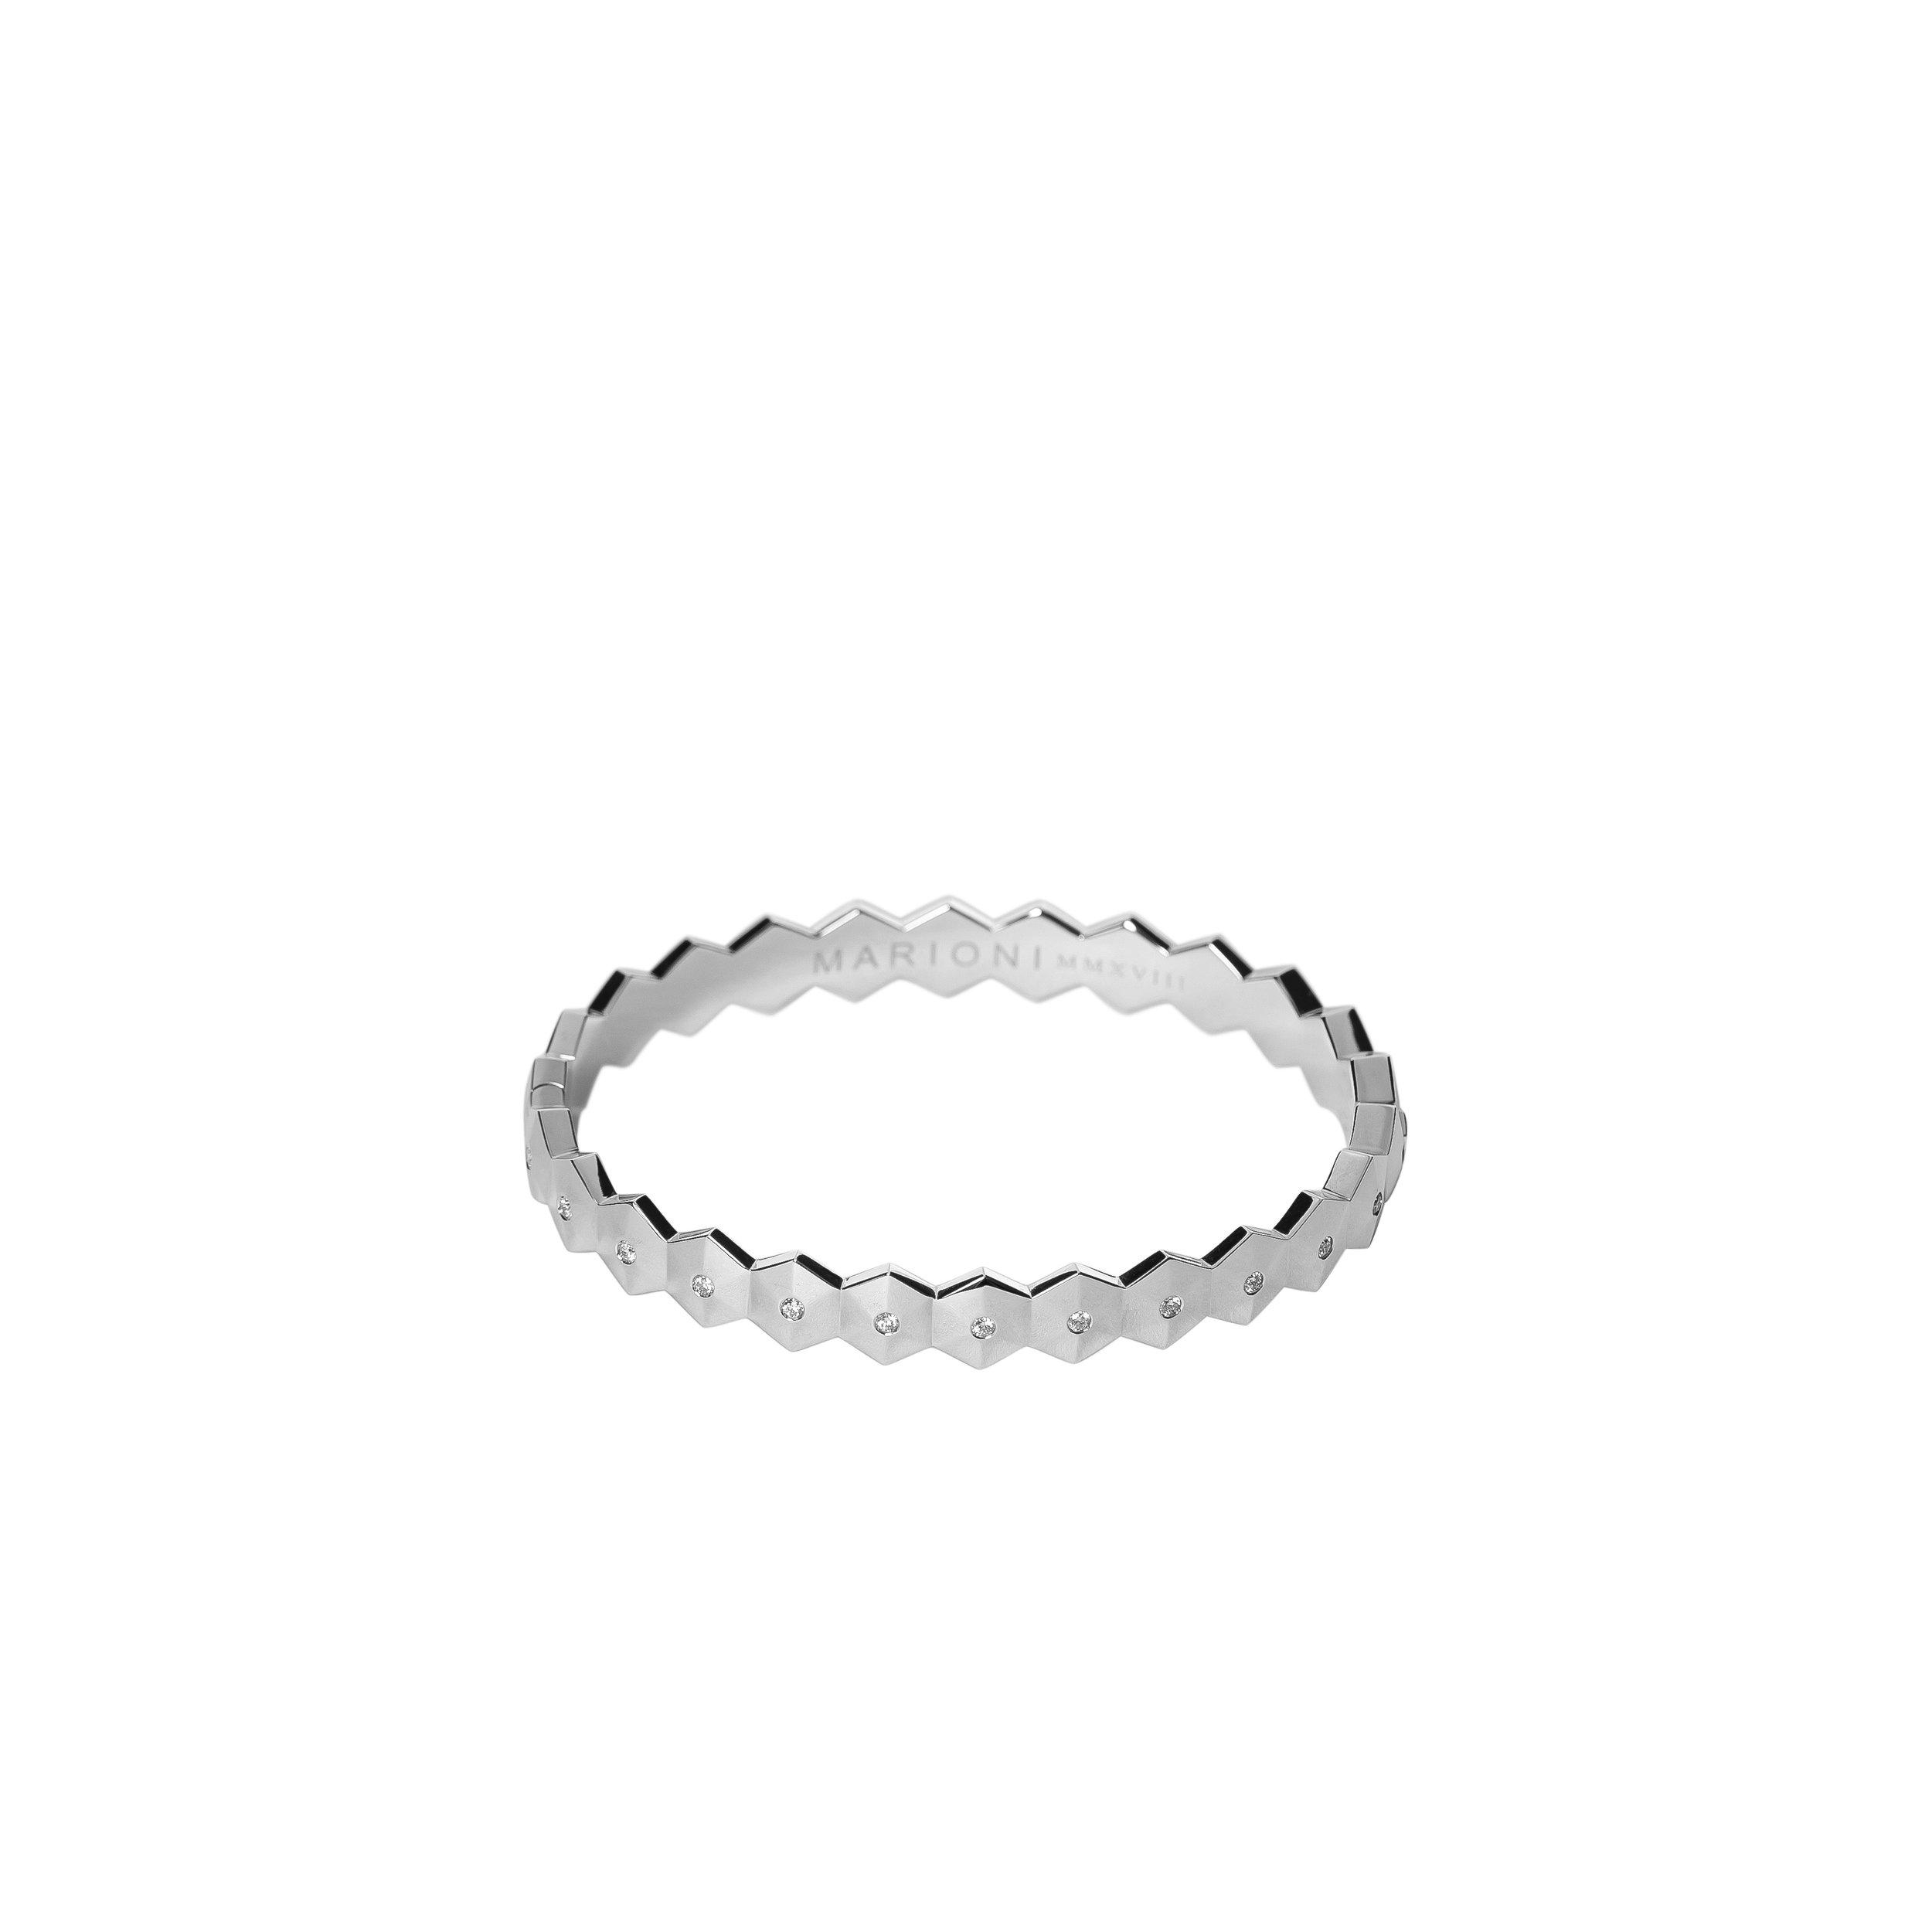 ABE1_Marioni_Jewelry_Studio_Products_WHITE_Bracelet.jpg